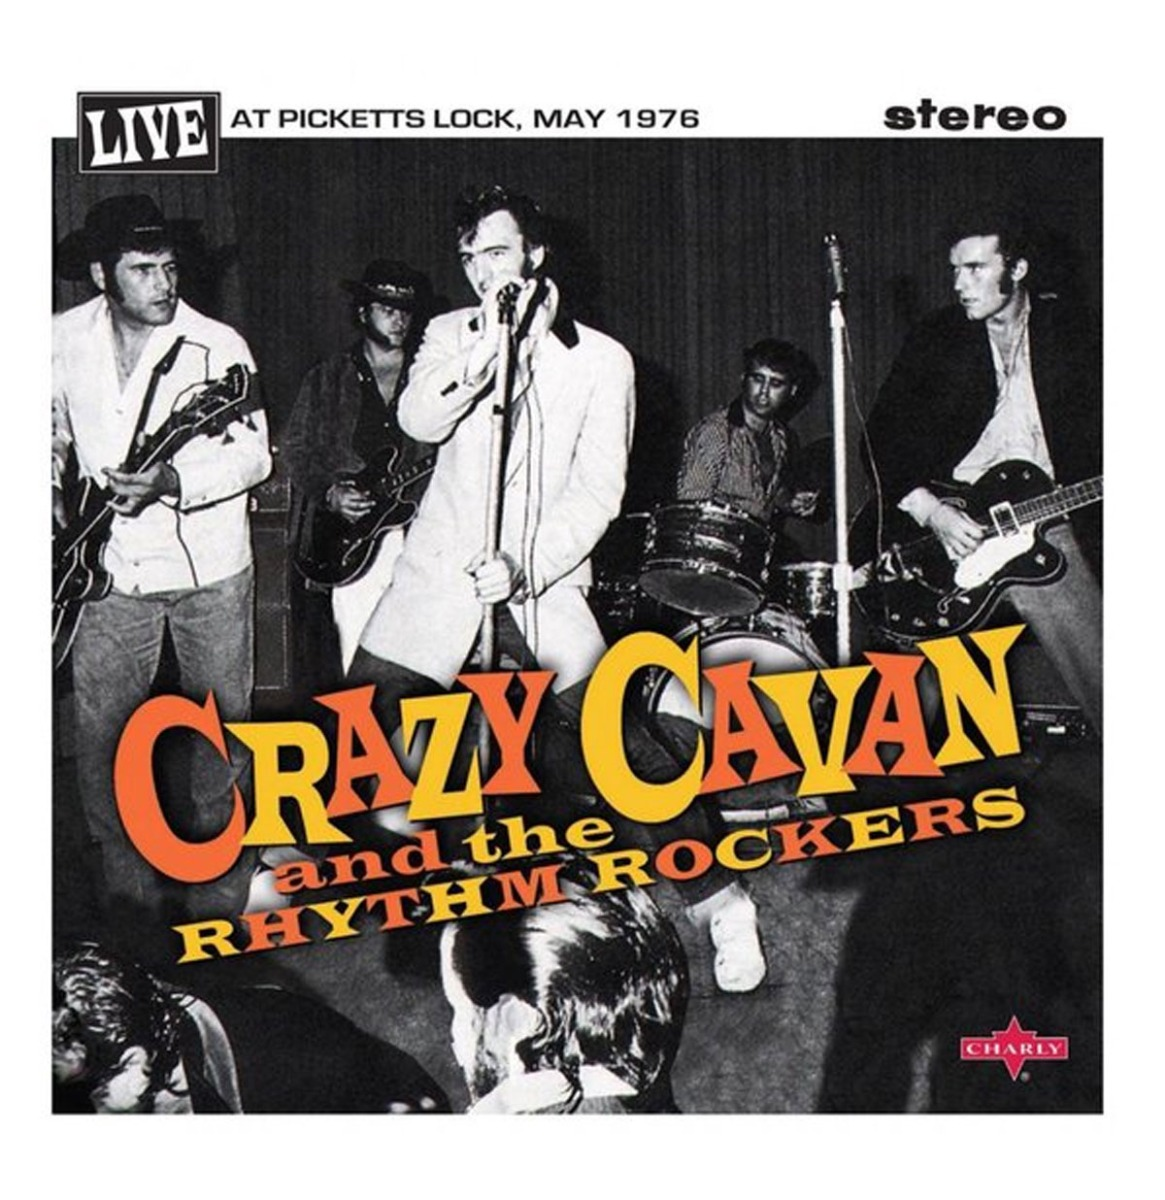 Crazy Cavan & The Rhythm Rockers - Live At Picketts Lock, May 1976 2 x 10